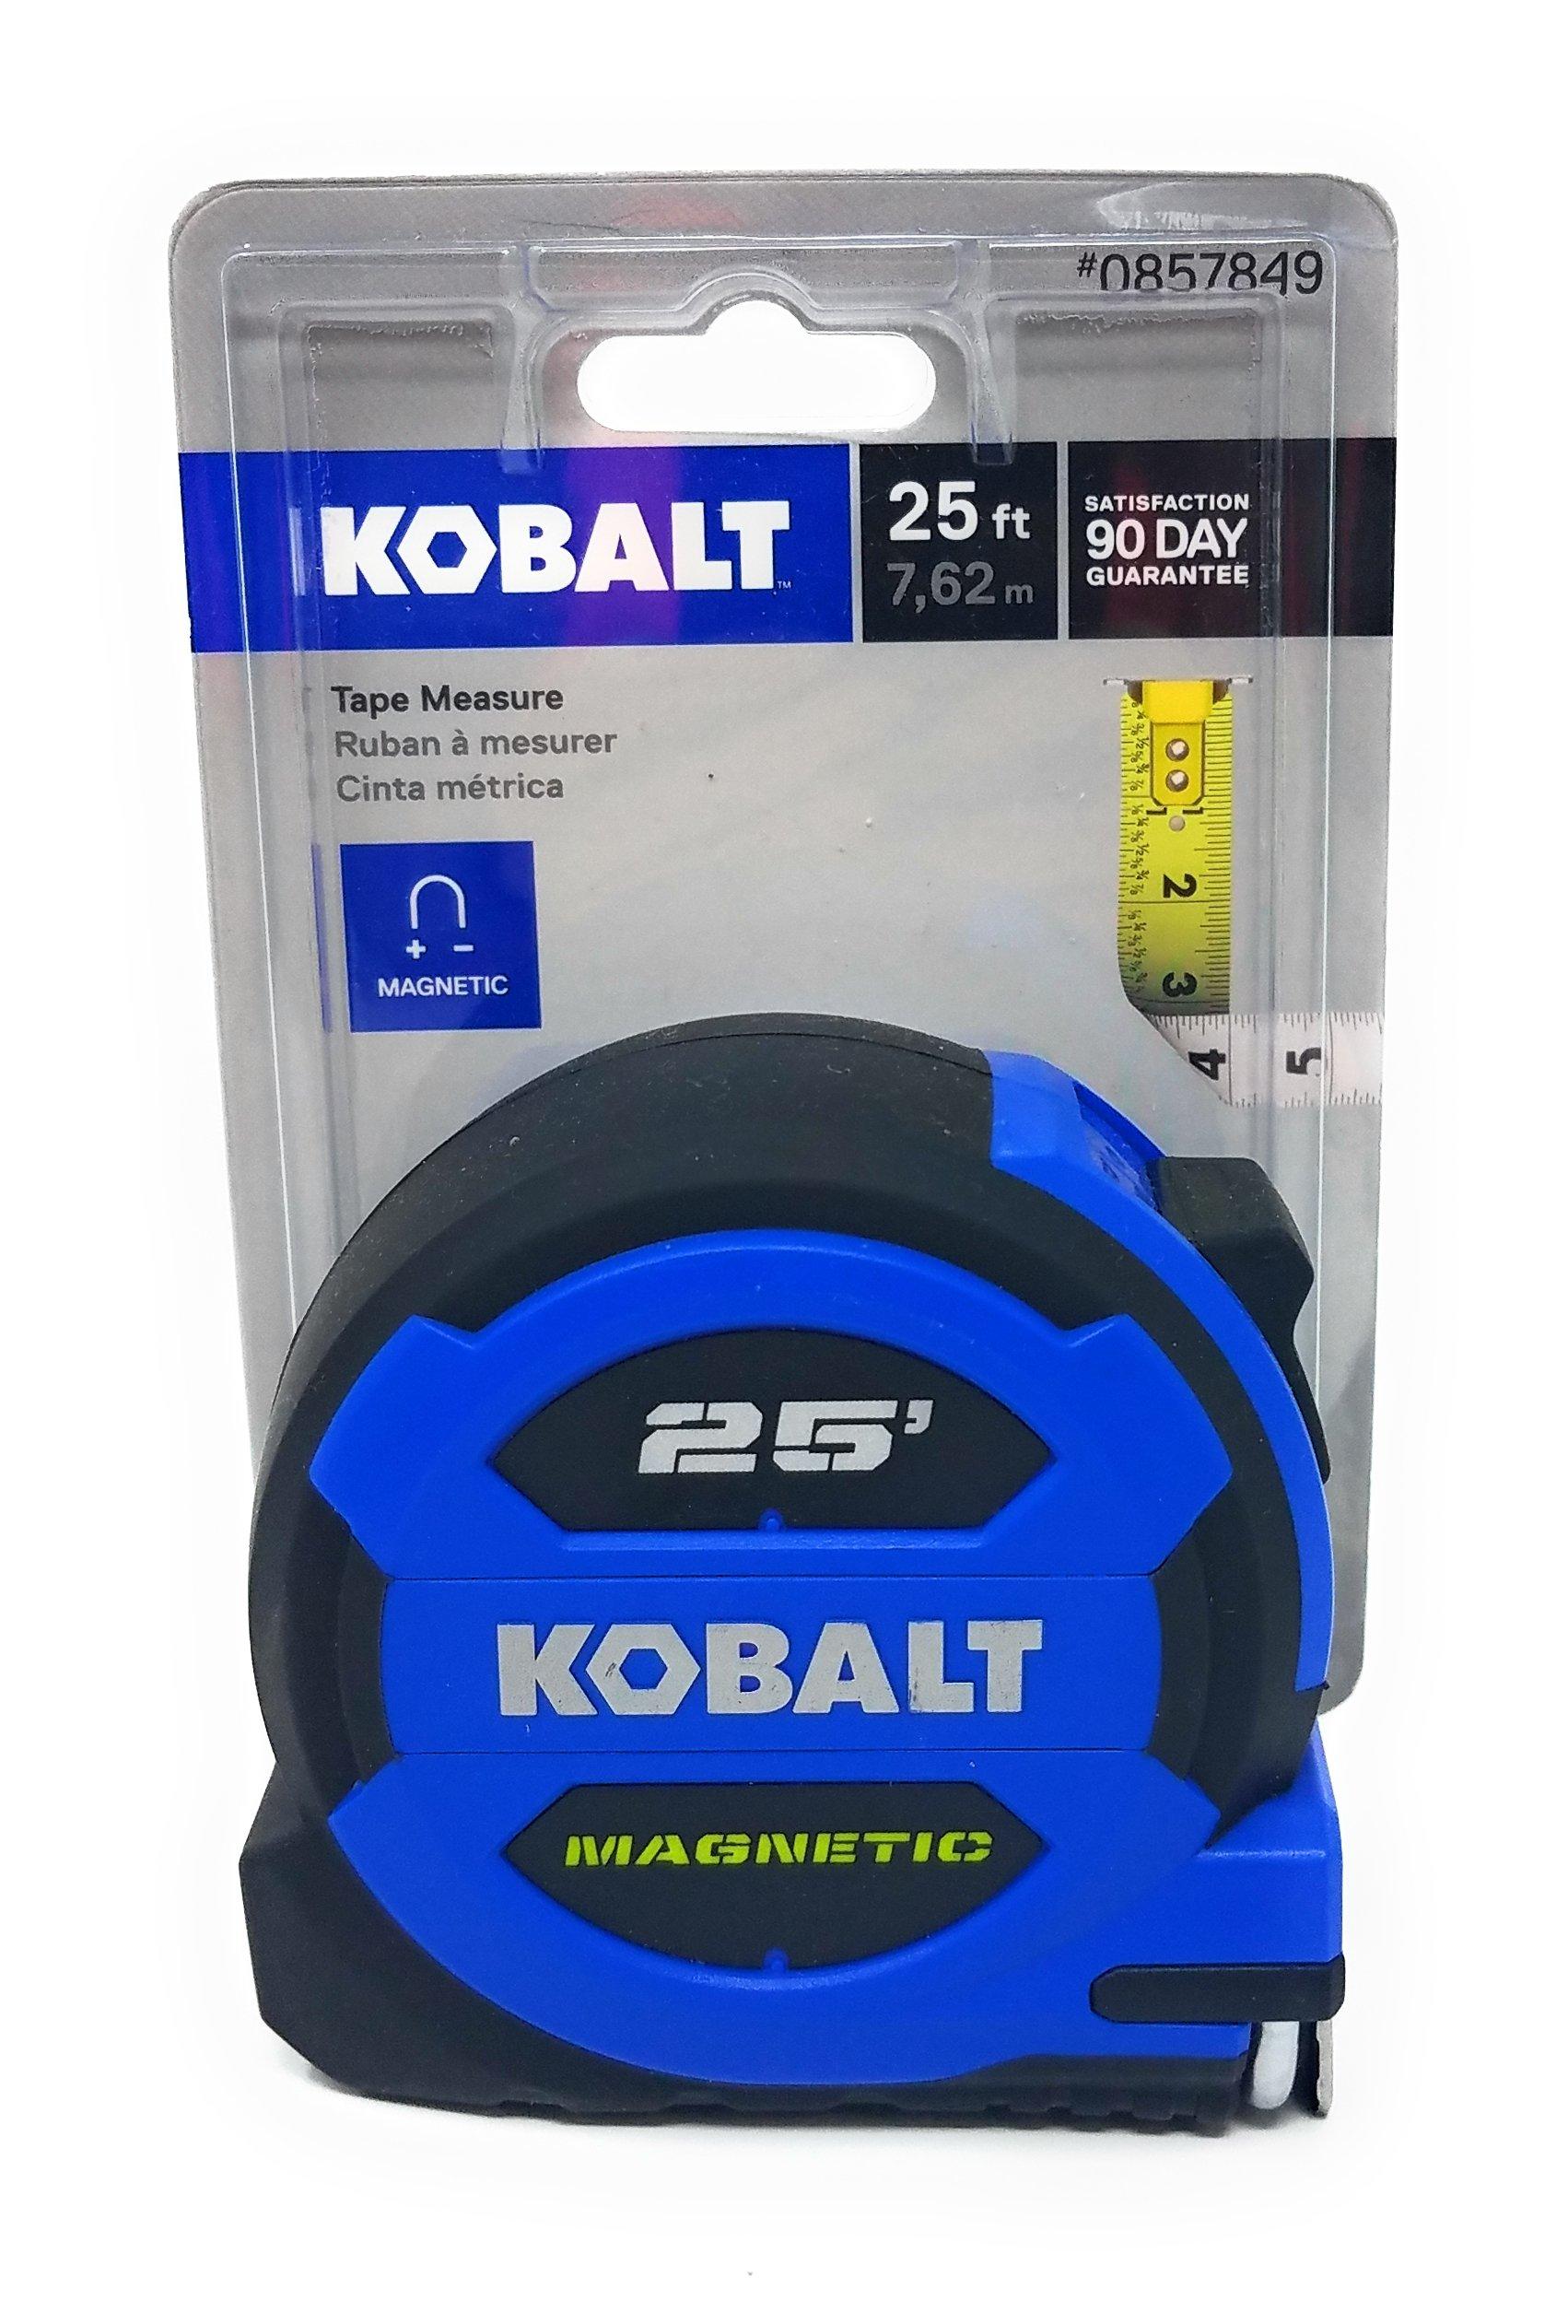 Kobalt 25' Magnetic Tape Measure and Tesadorz Microfiber Cloth by Kobalt, Tesadorz (Image #2)